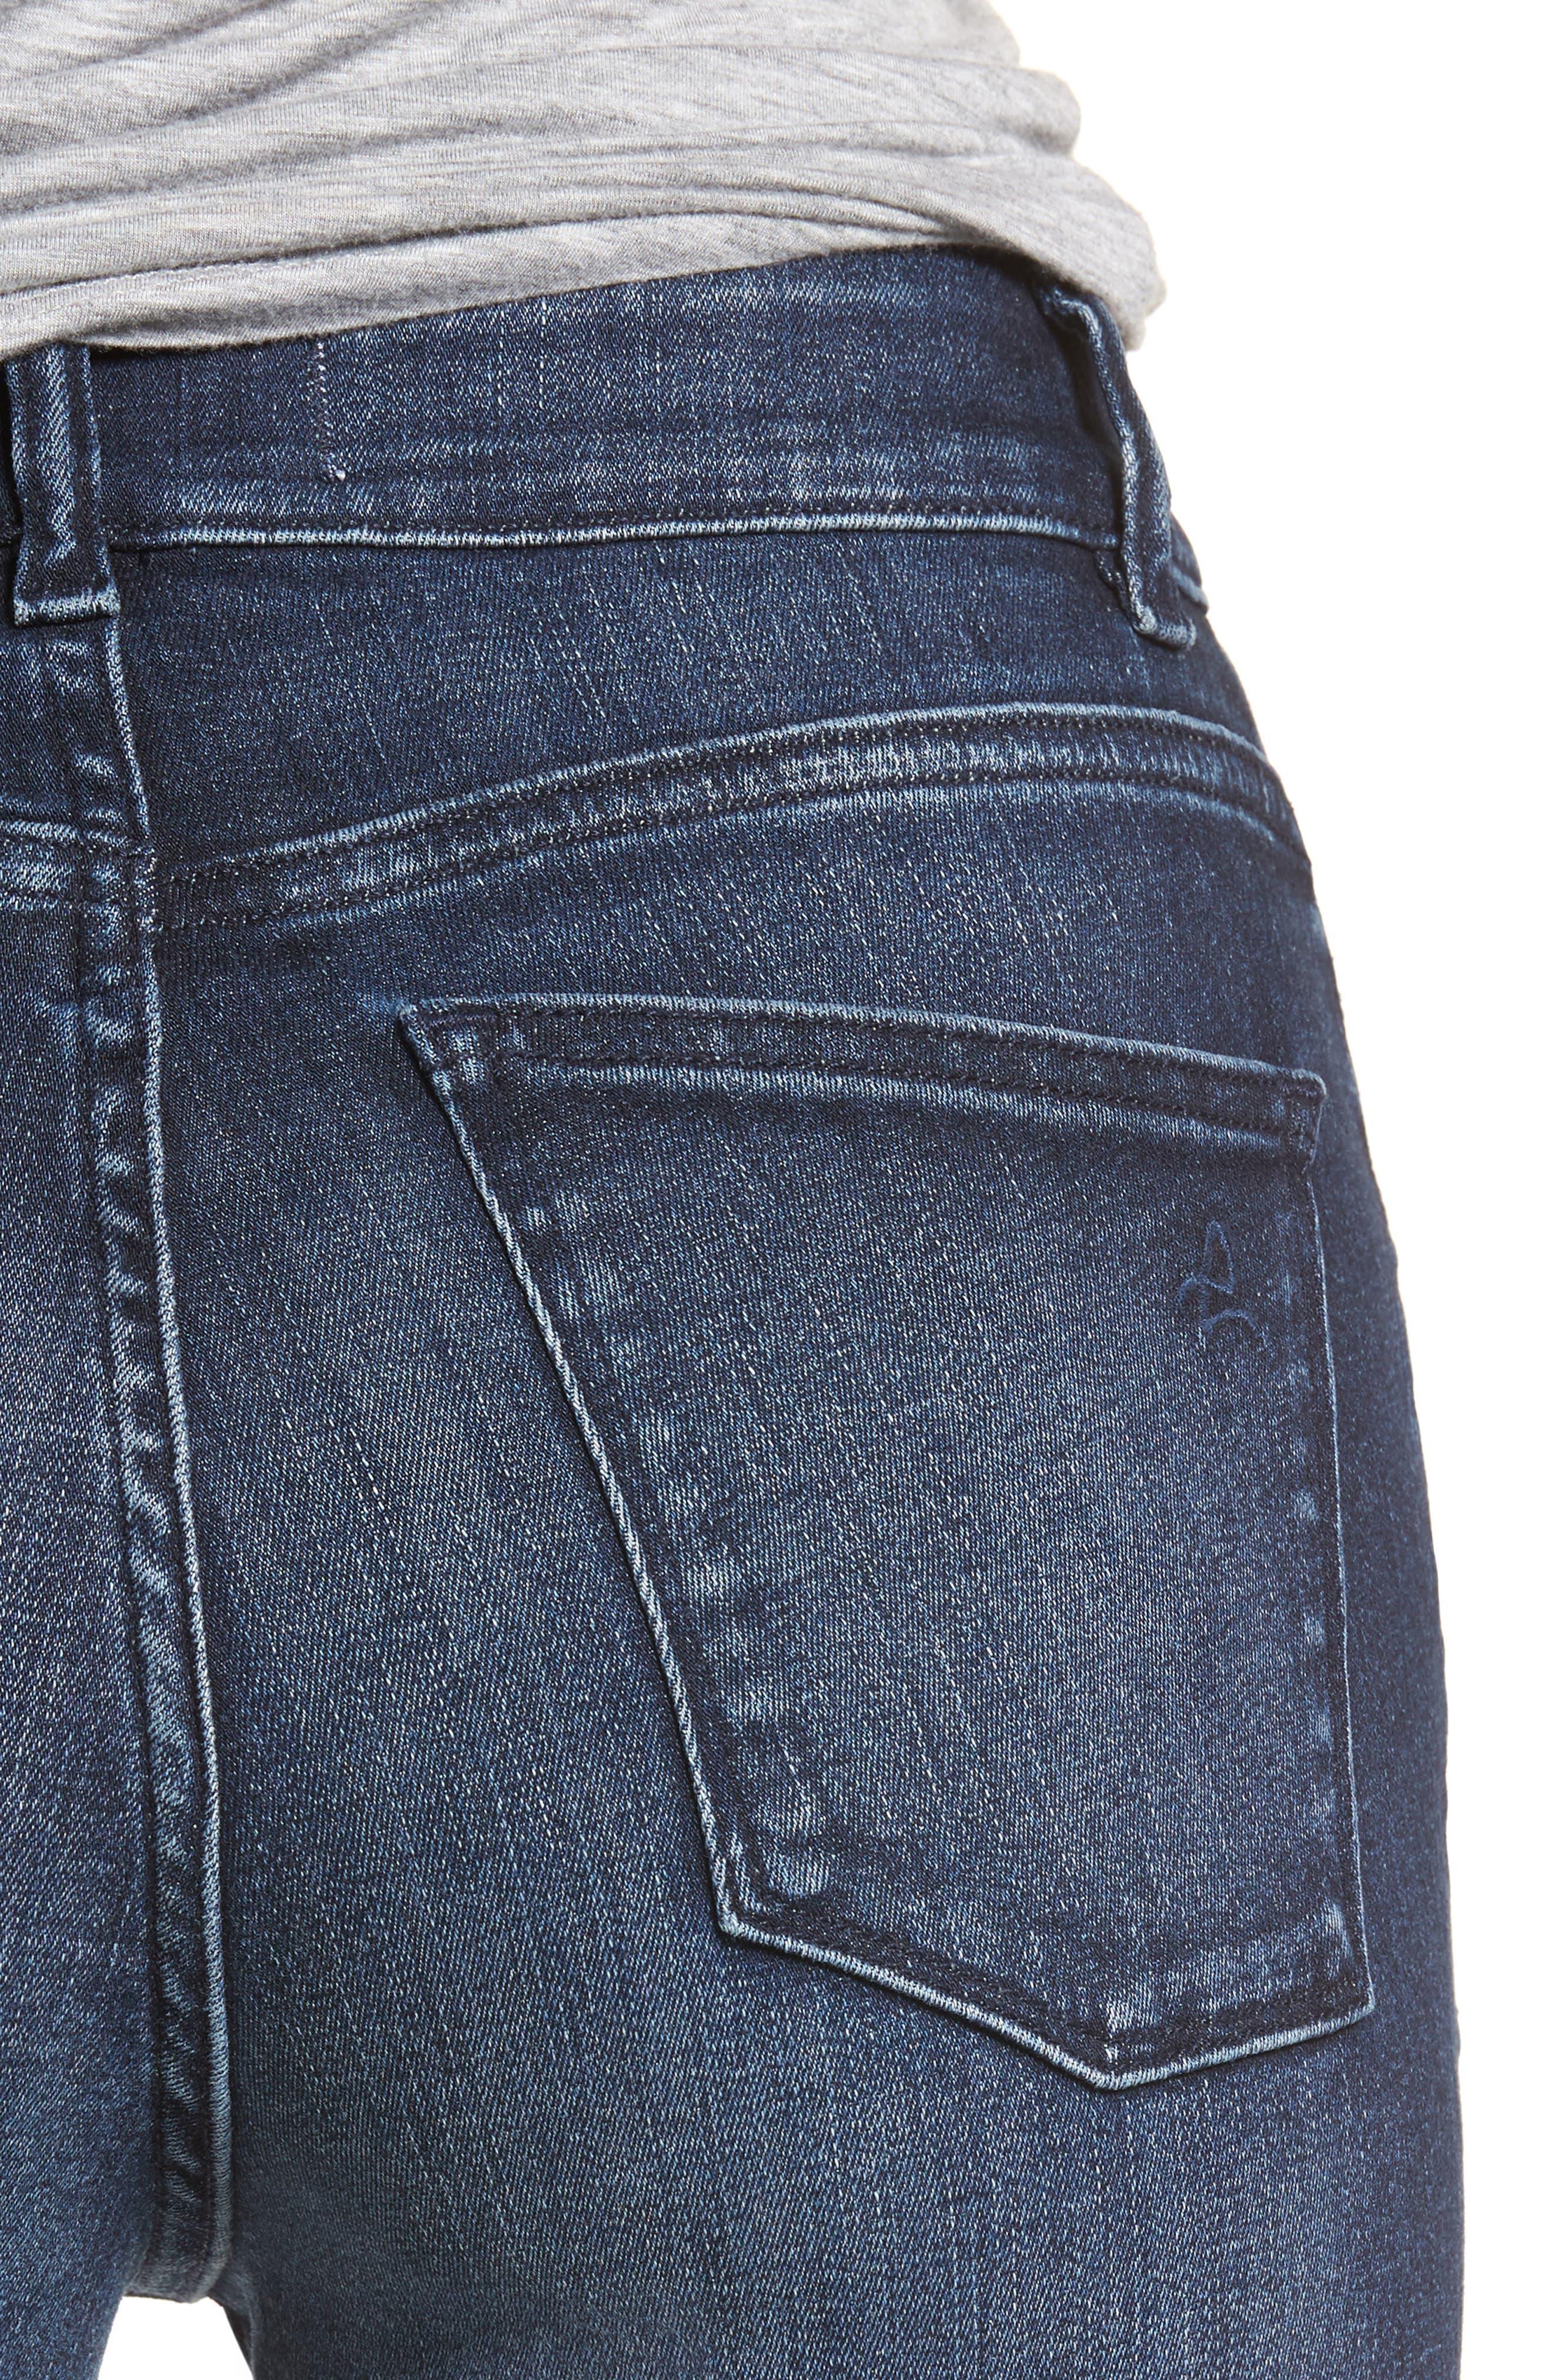 Carlie High Waist Ankle Skinny Jeans,                             Alternate thumbnail 4, color,                             Spritz